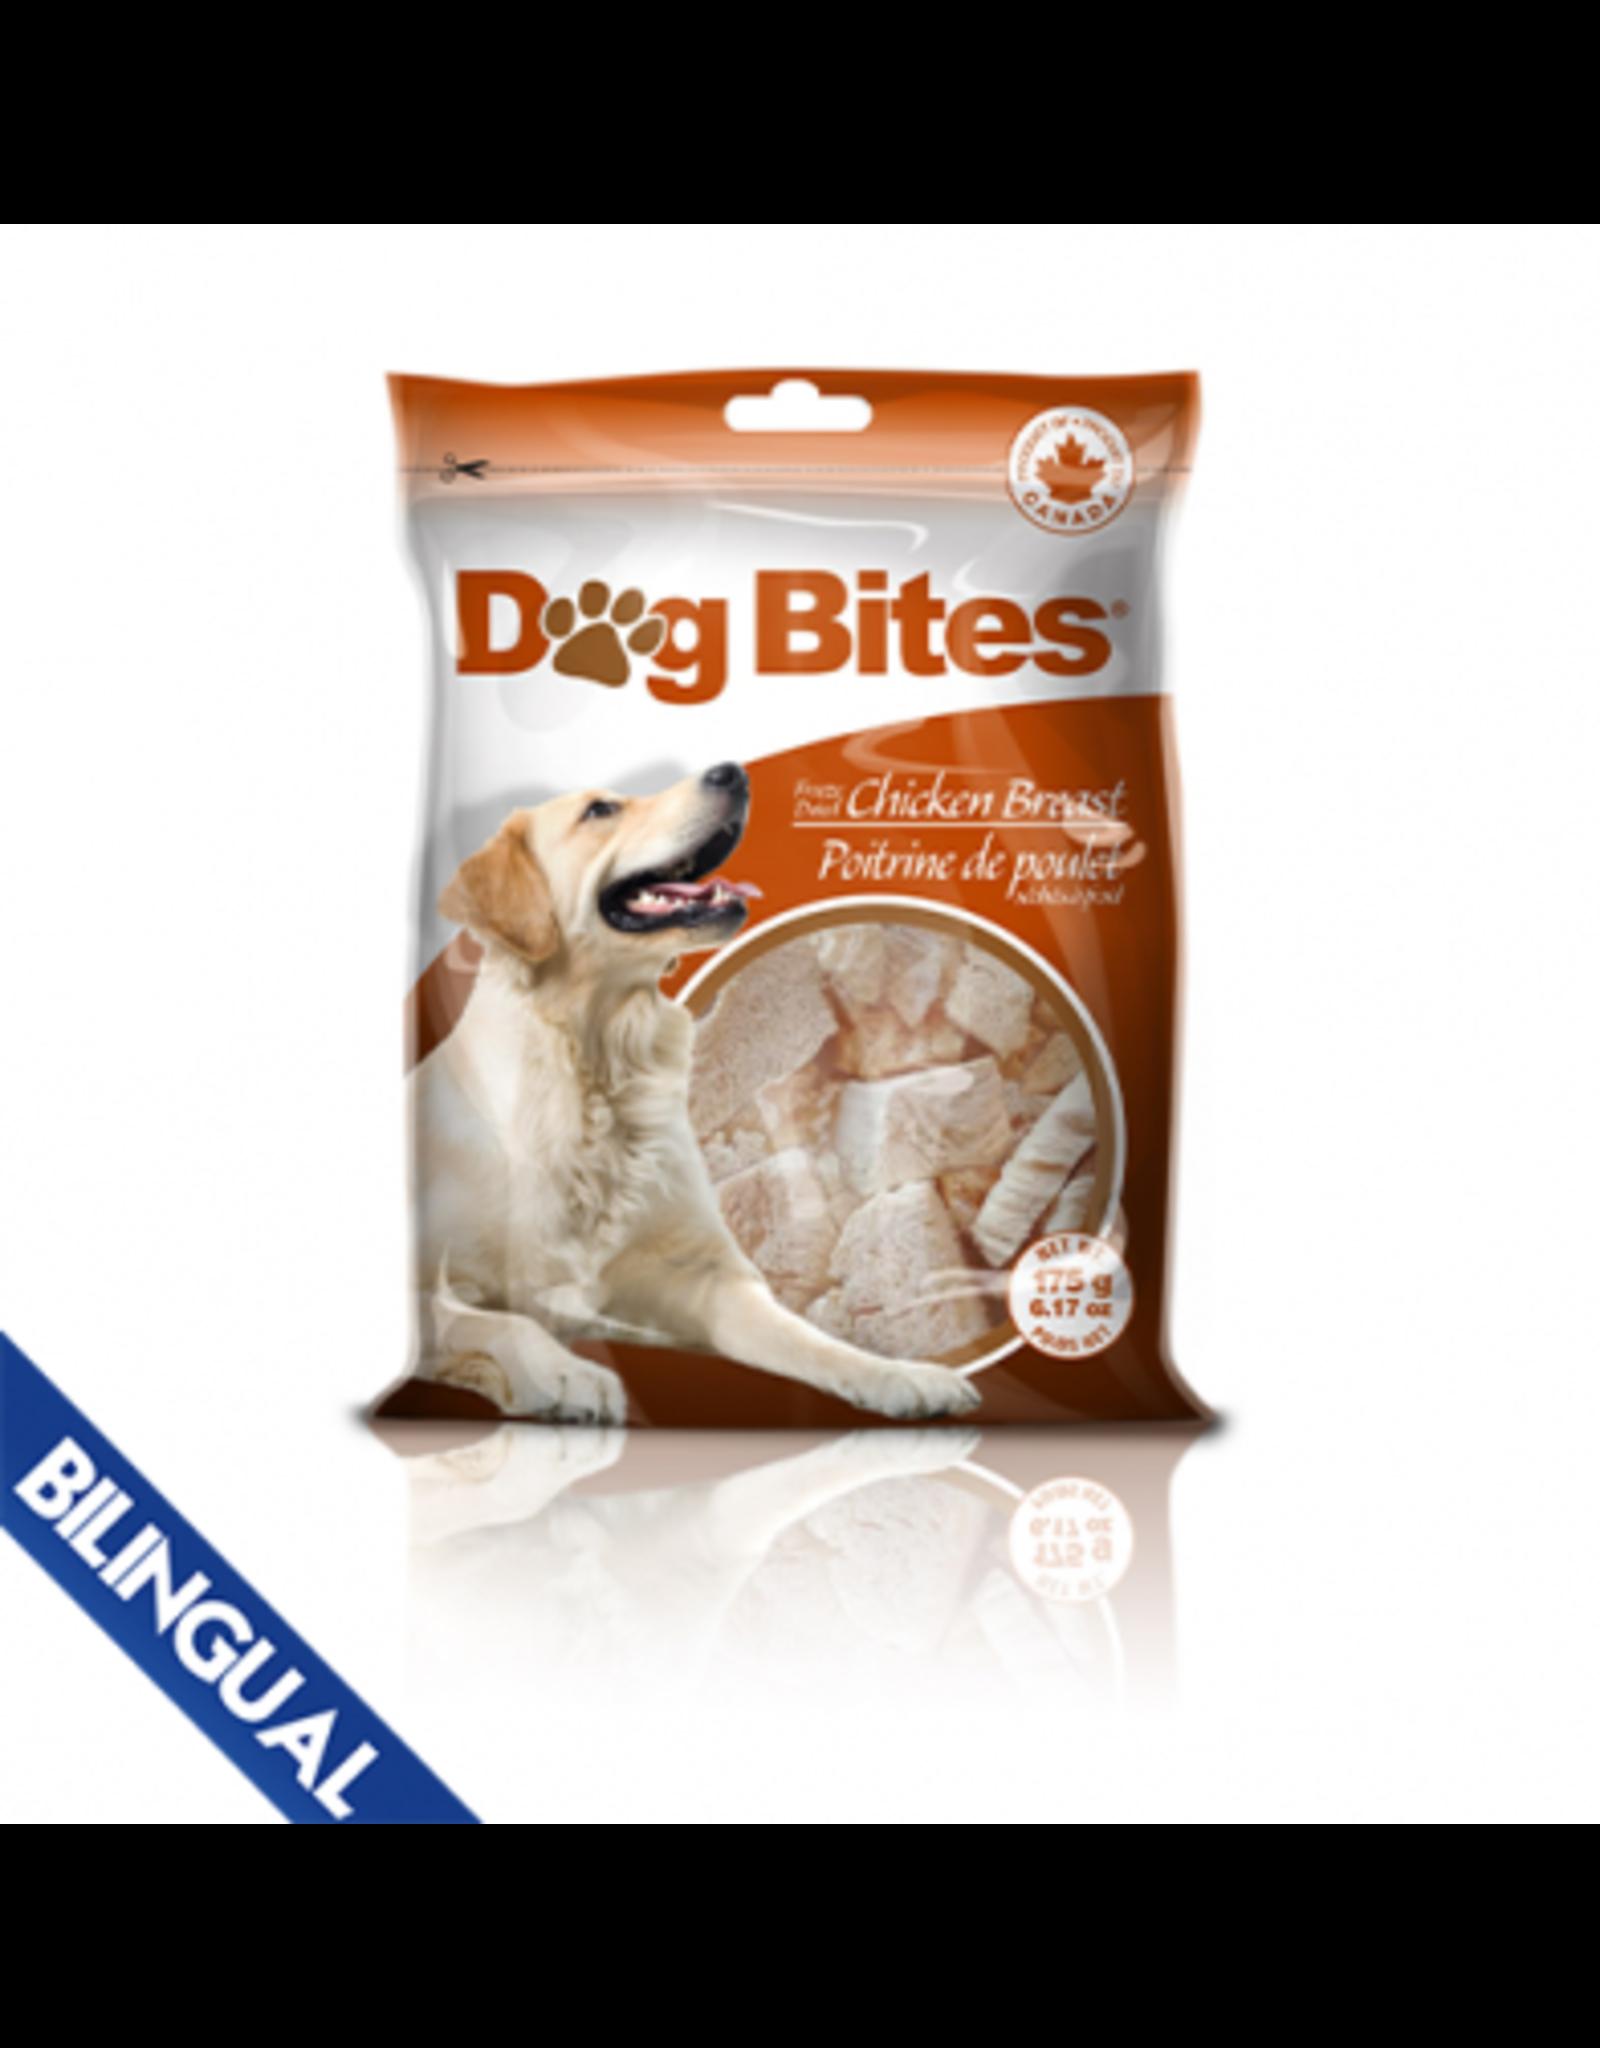 Dog Bites Dog Bites Chicken Breast Freeze Dried Dog Treats